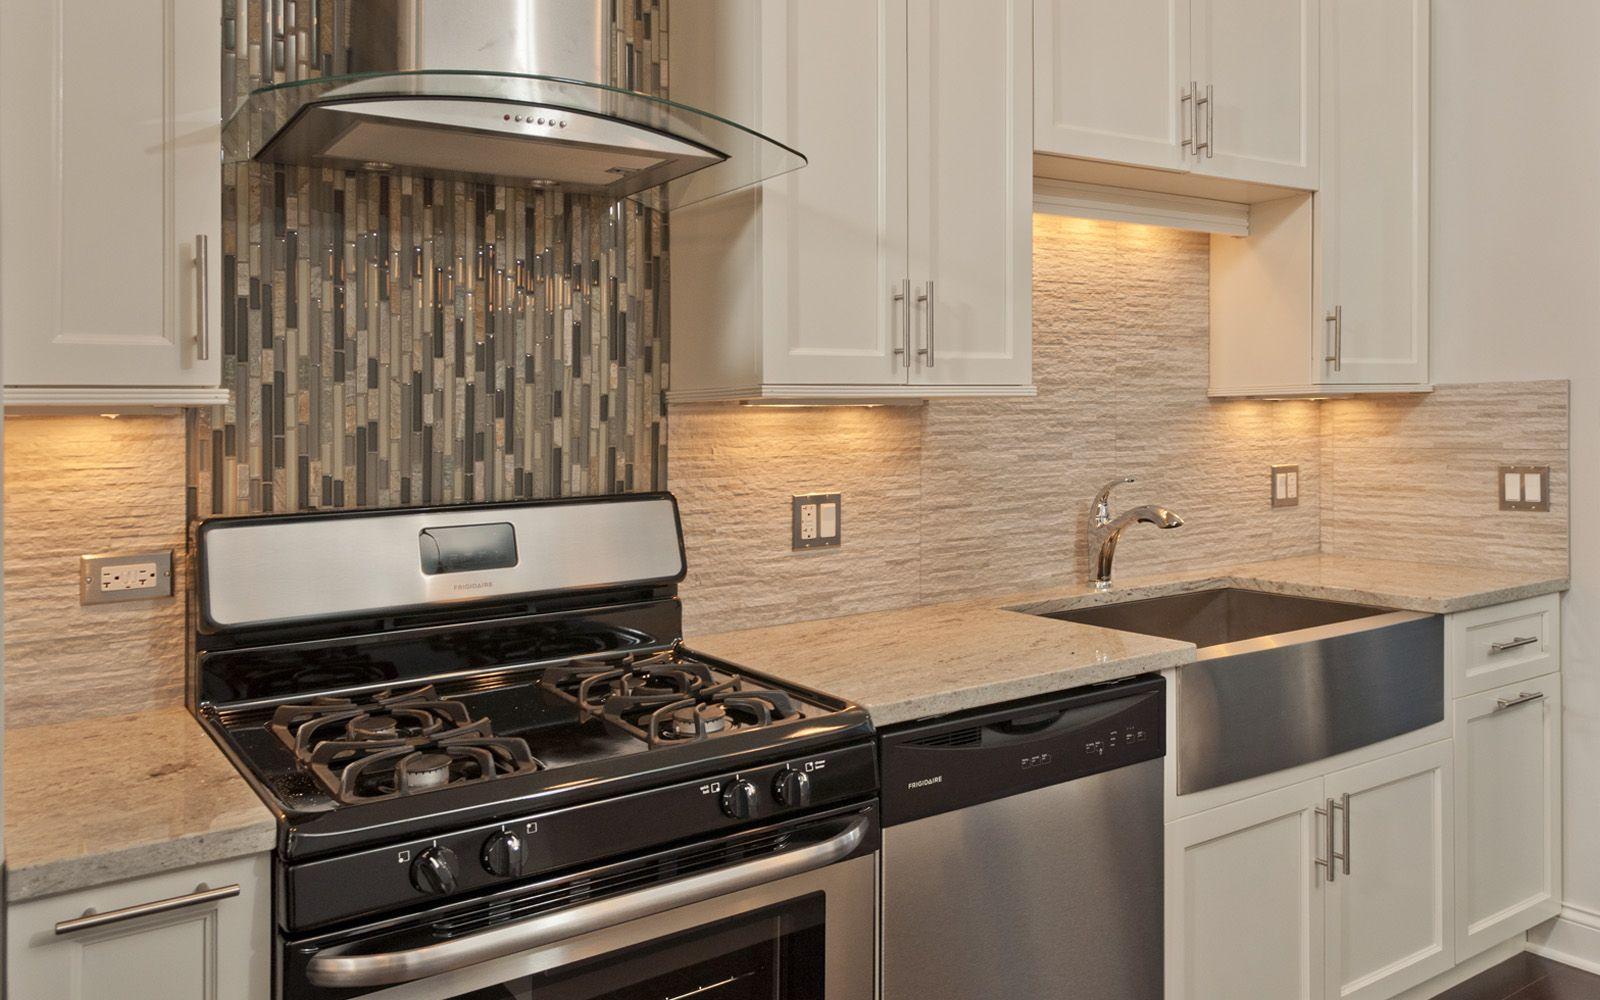 Mid america tile elk grove village - 15 Best Kitchens Residential Images On Pinterest Flooring Backsplash And Showroom